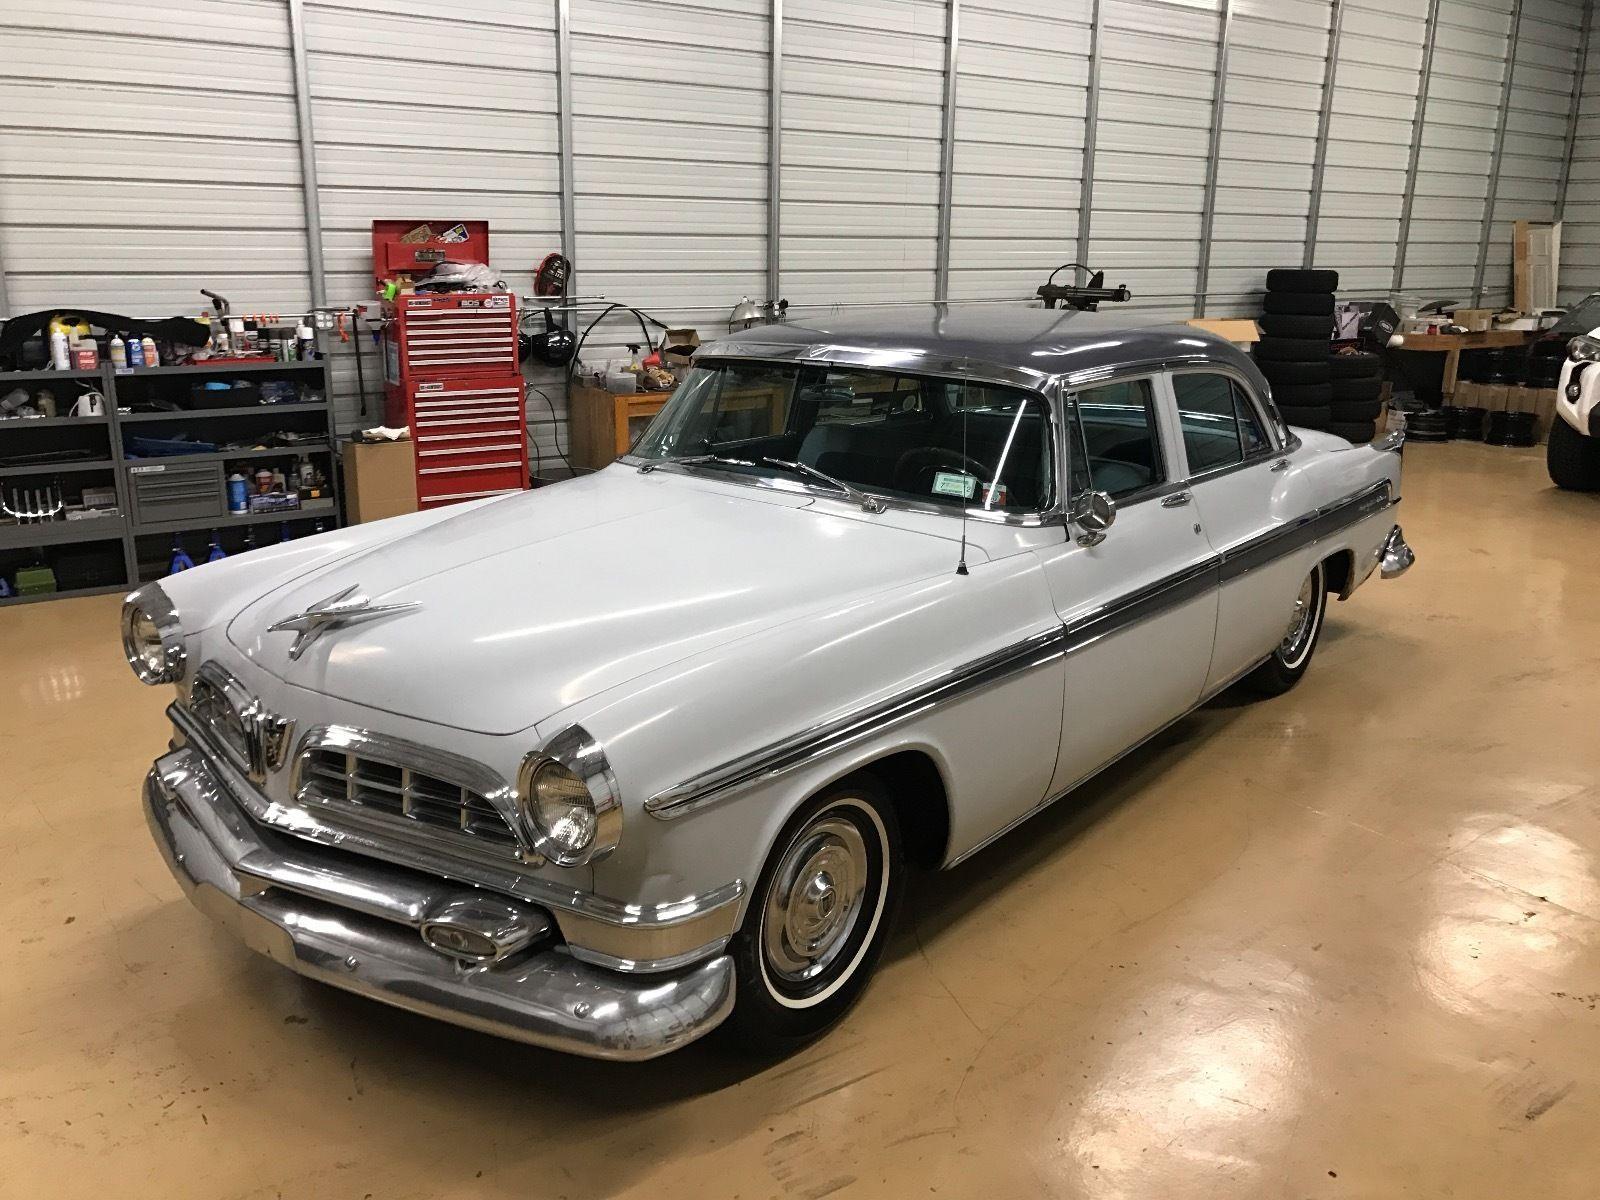 eb0da95c5c1294b17714e9226fbd6746 Great Description About 1955 Chrysler 300 for Sale with Inspiring Images Cars Review